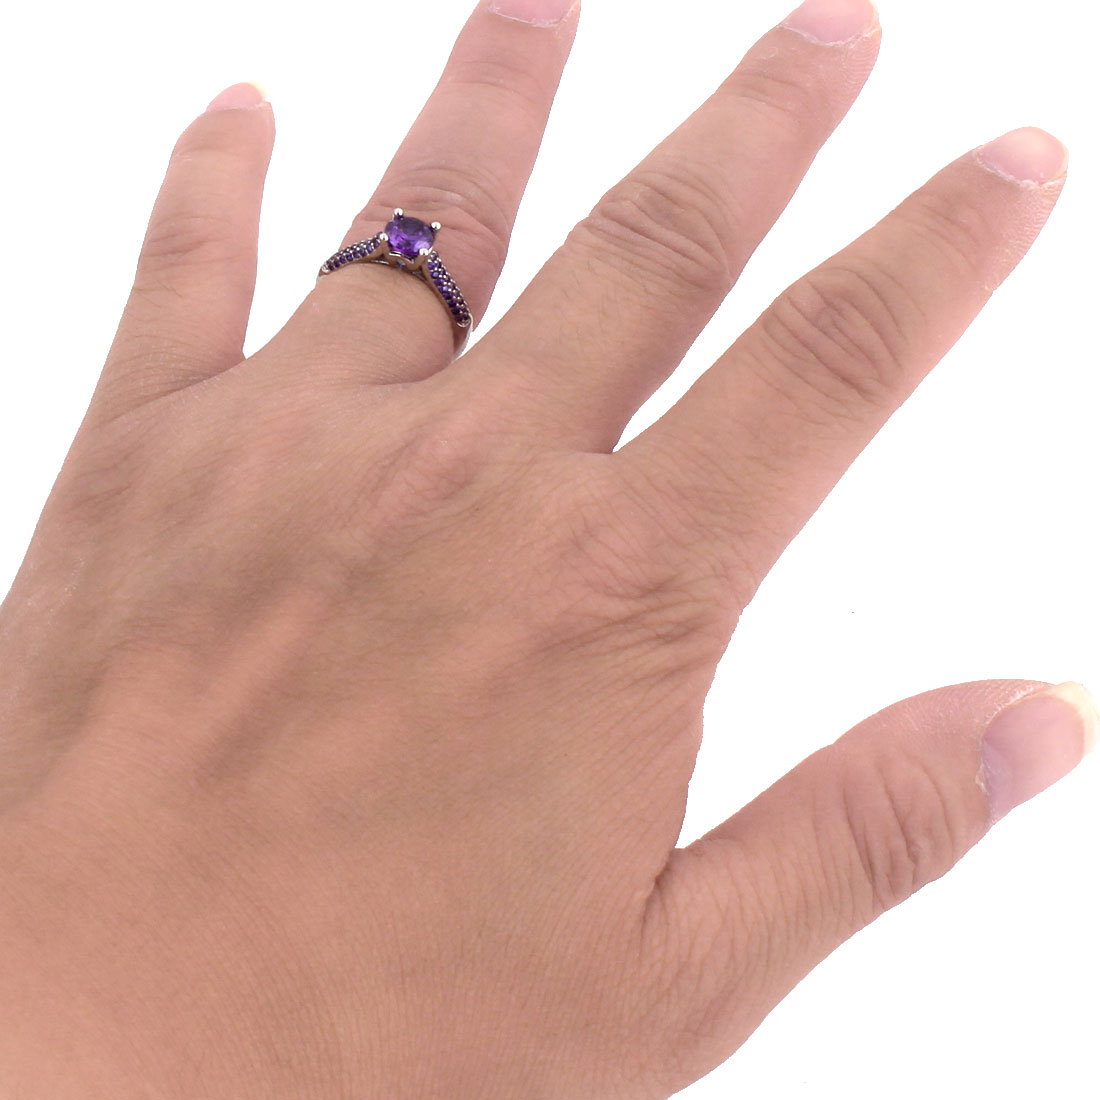 Woman Ladies Metal Faux Rhinestone Inlaid Finger Ring Silver Tone Purple US 7 - image 2 of 3